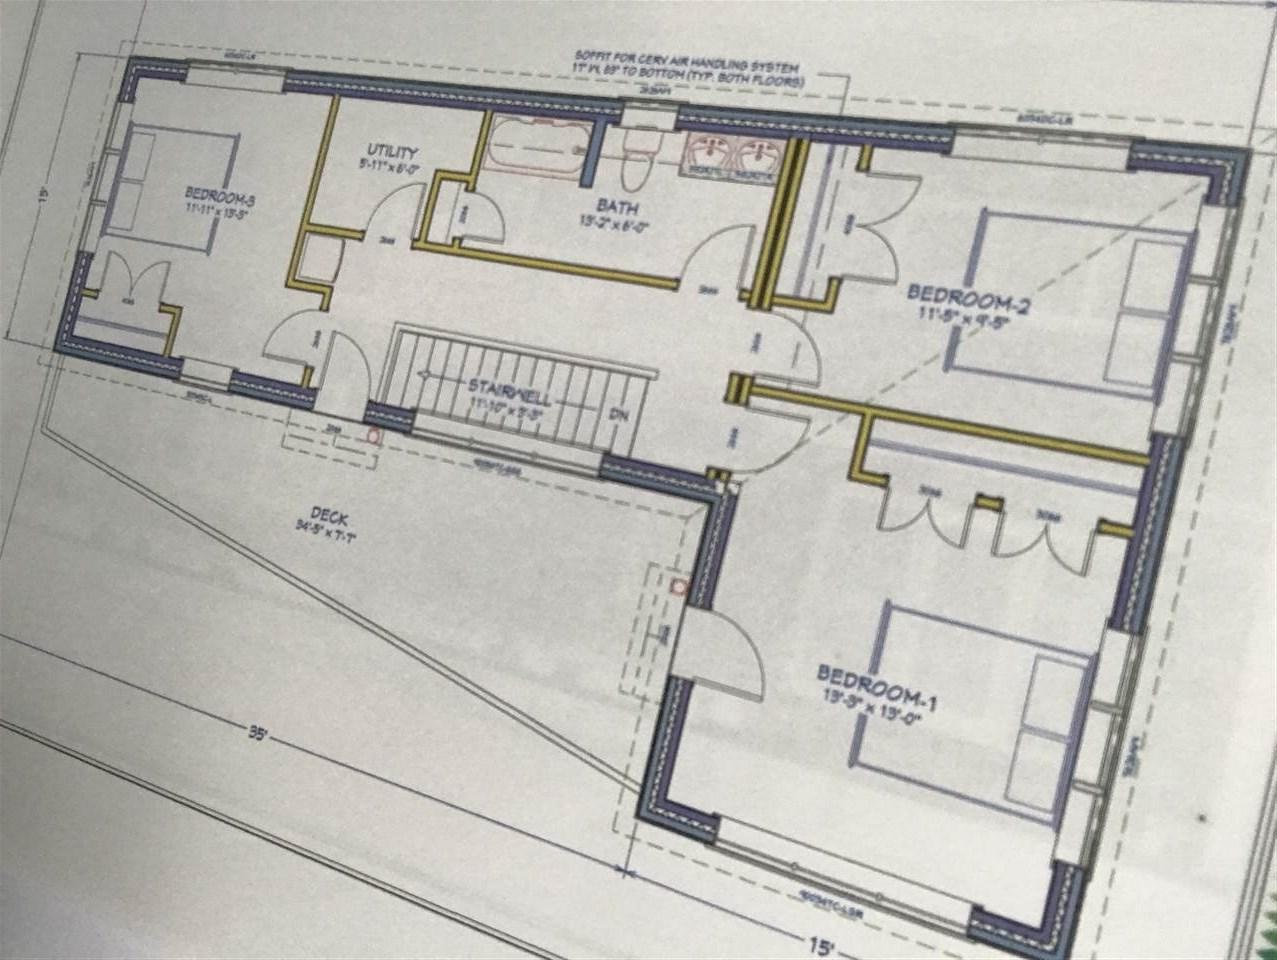 Possible level 2 upstairs floor plan